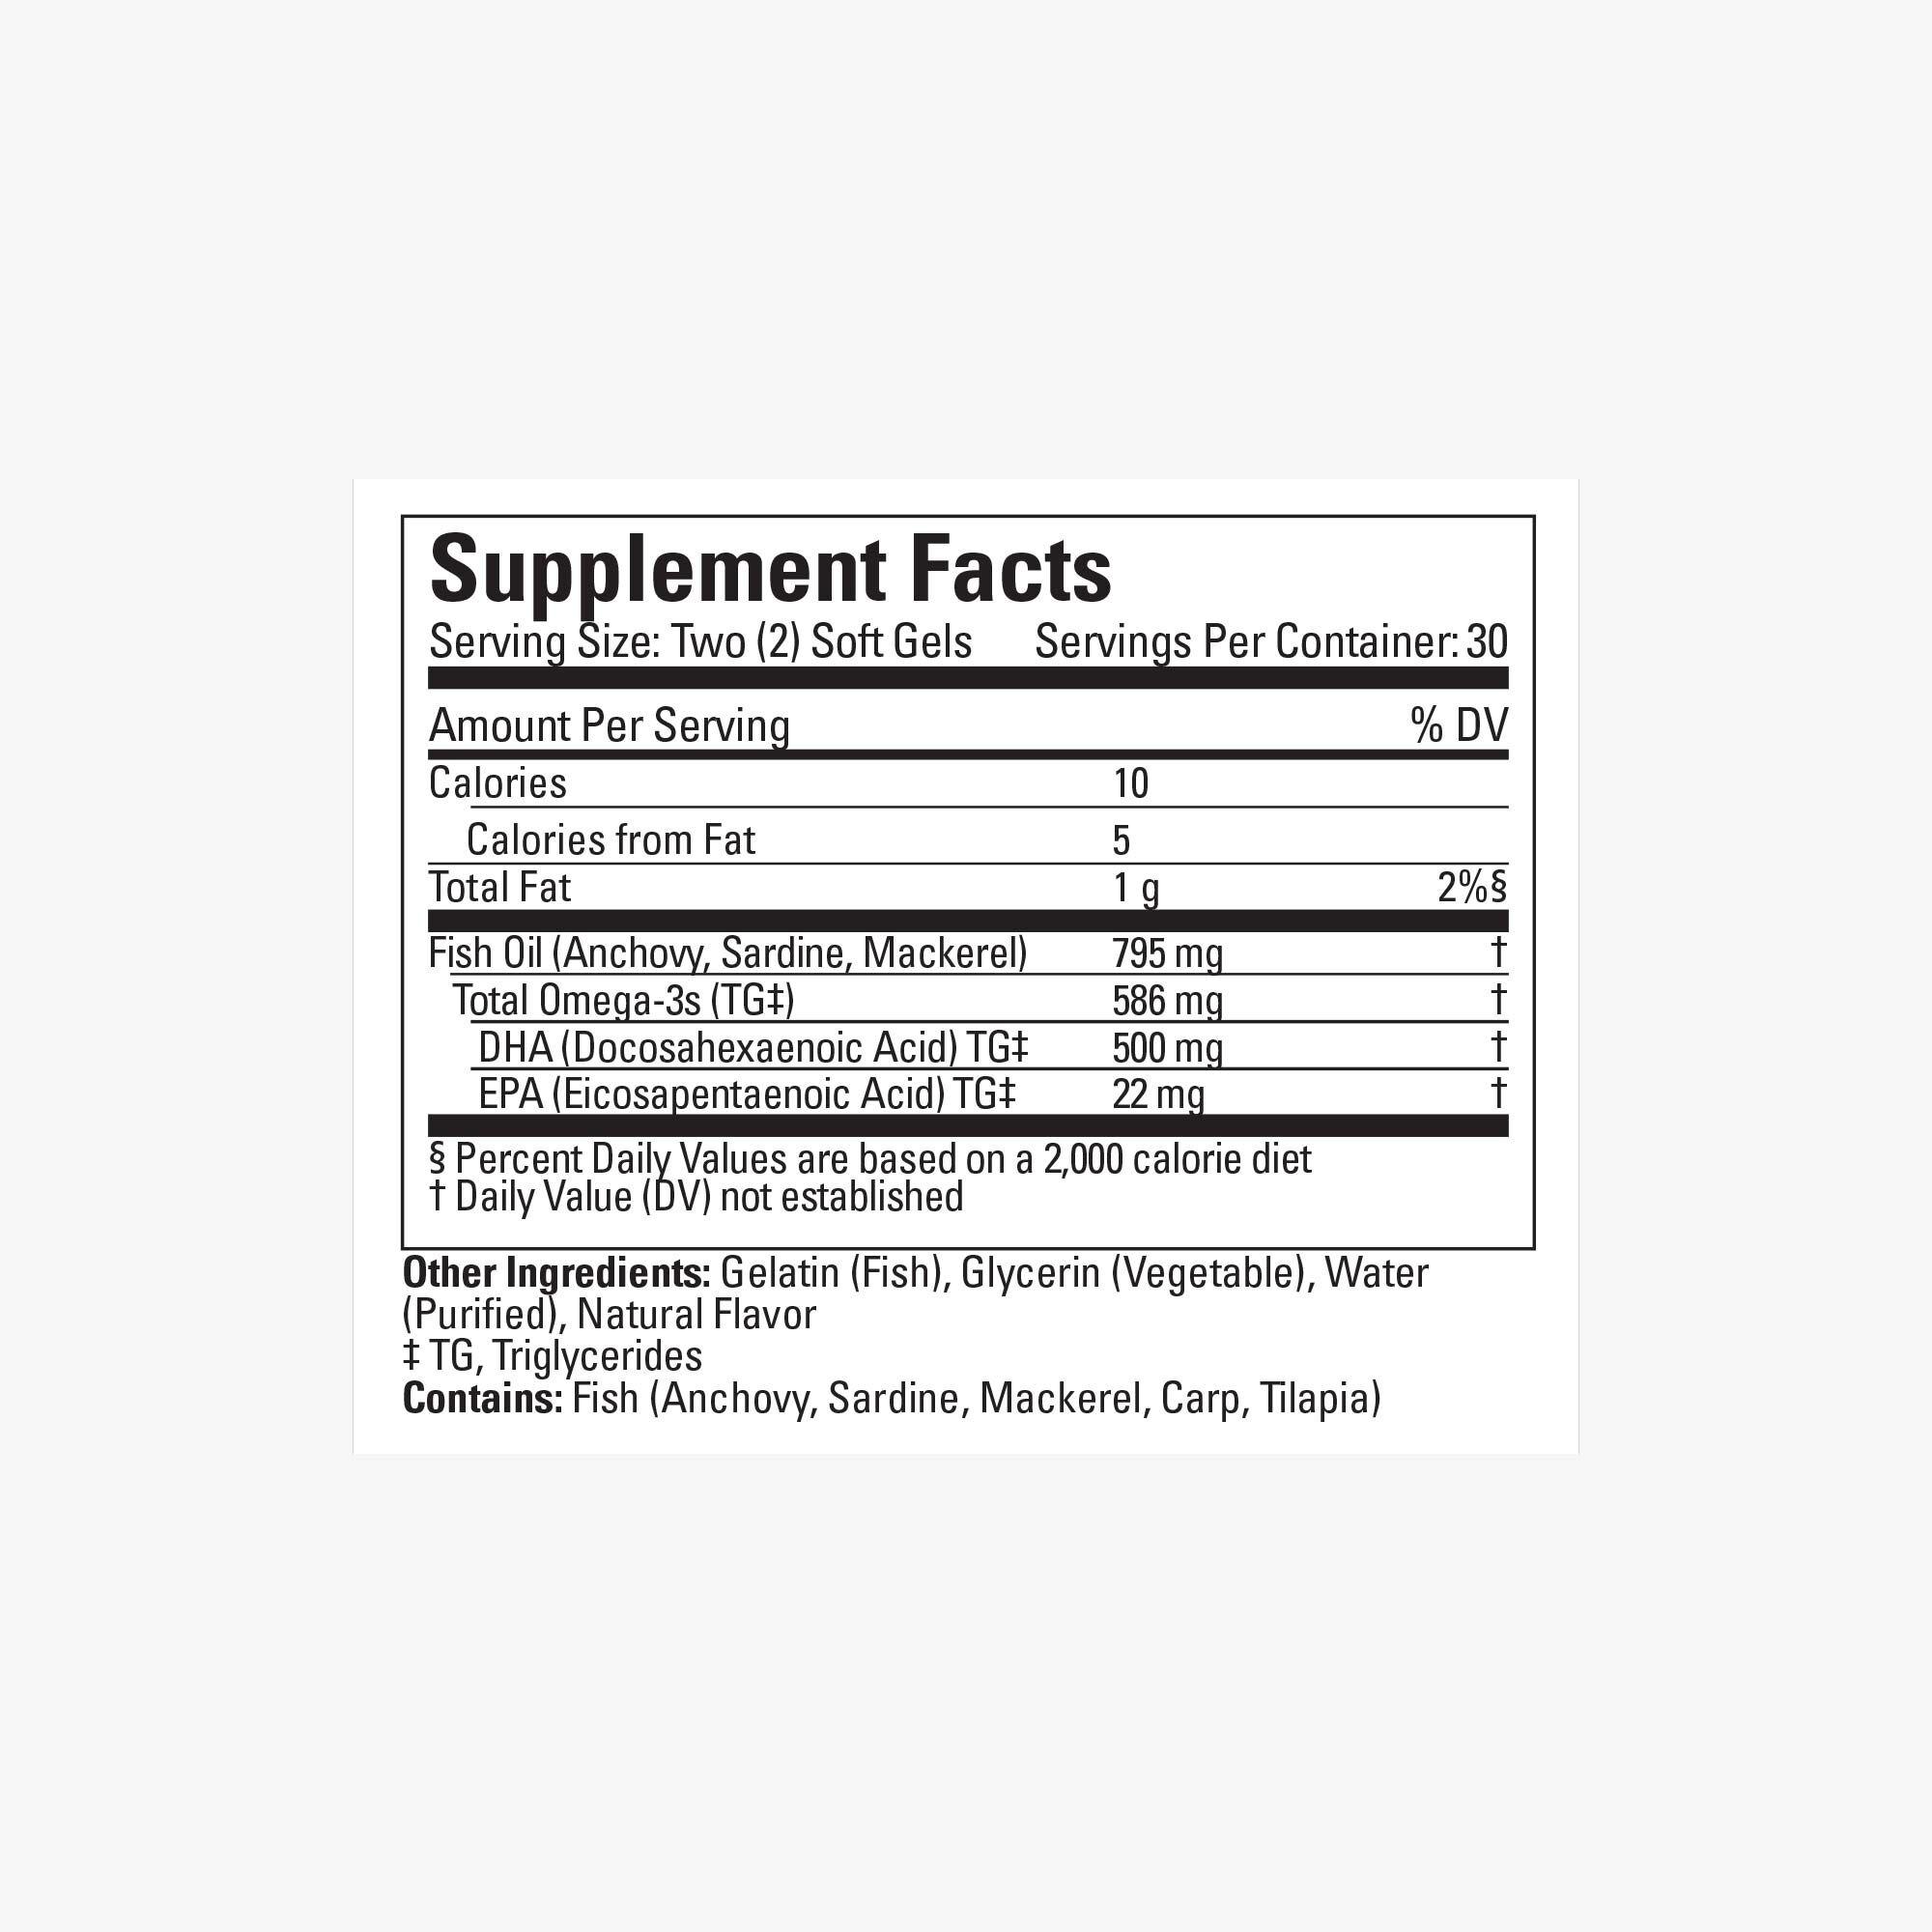 Prenatal DHA supplement fact panel